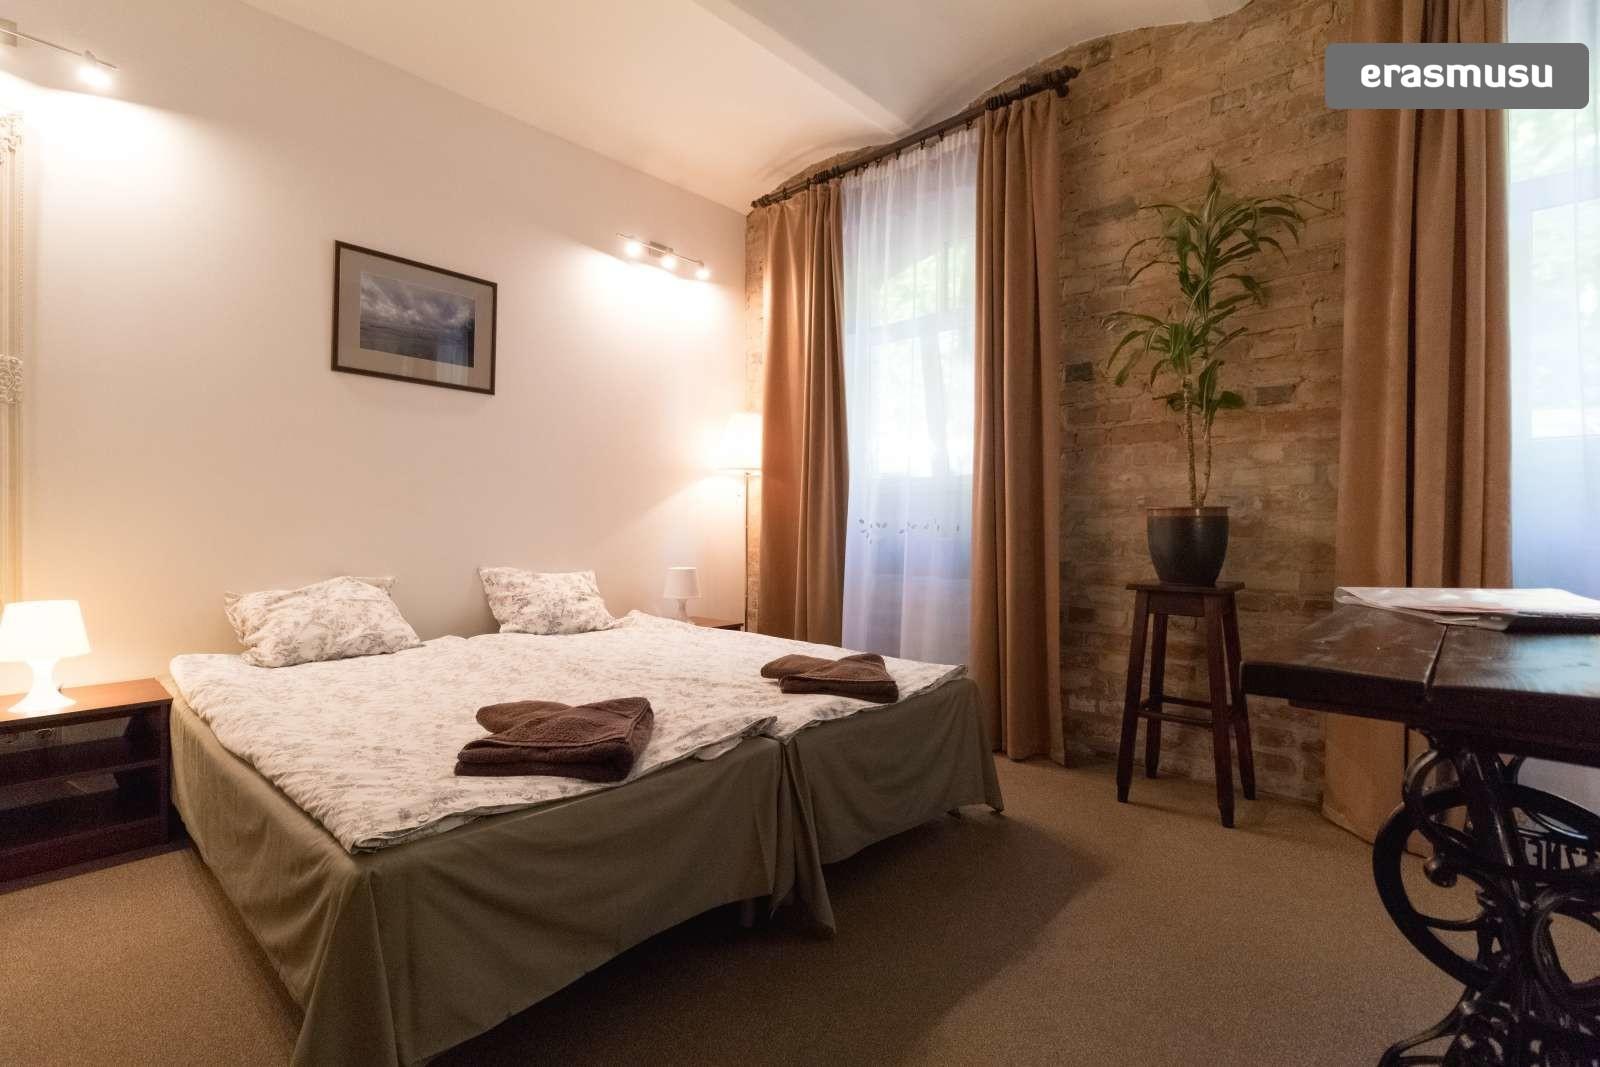 spacious-ensuite-room-kitchenette-rent-agenskalns-f680da797a9256